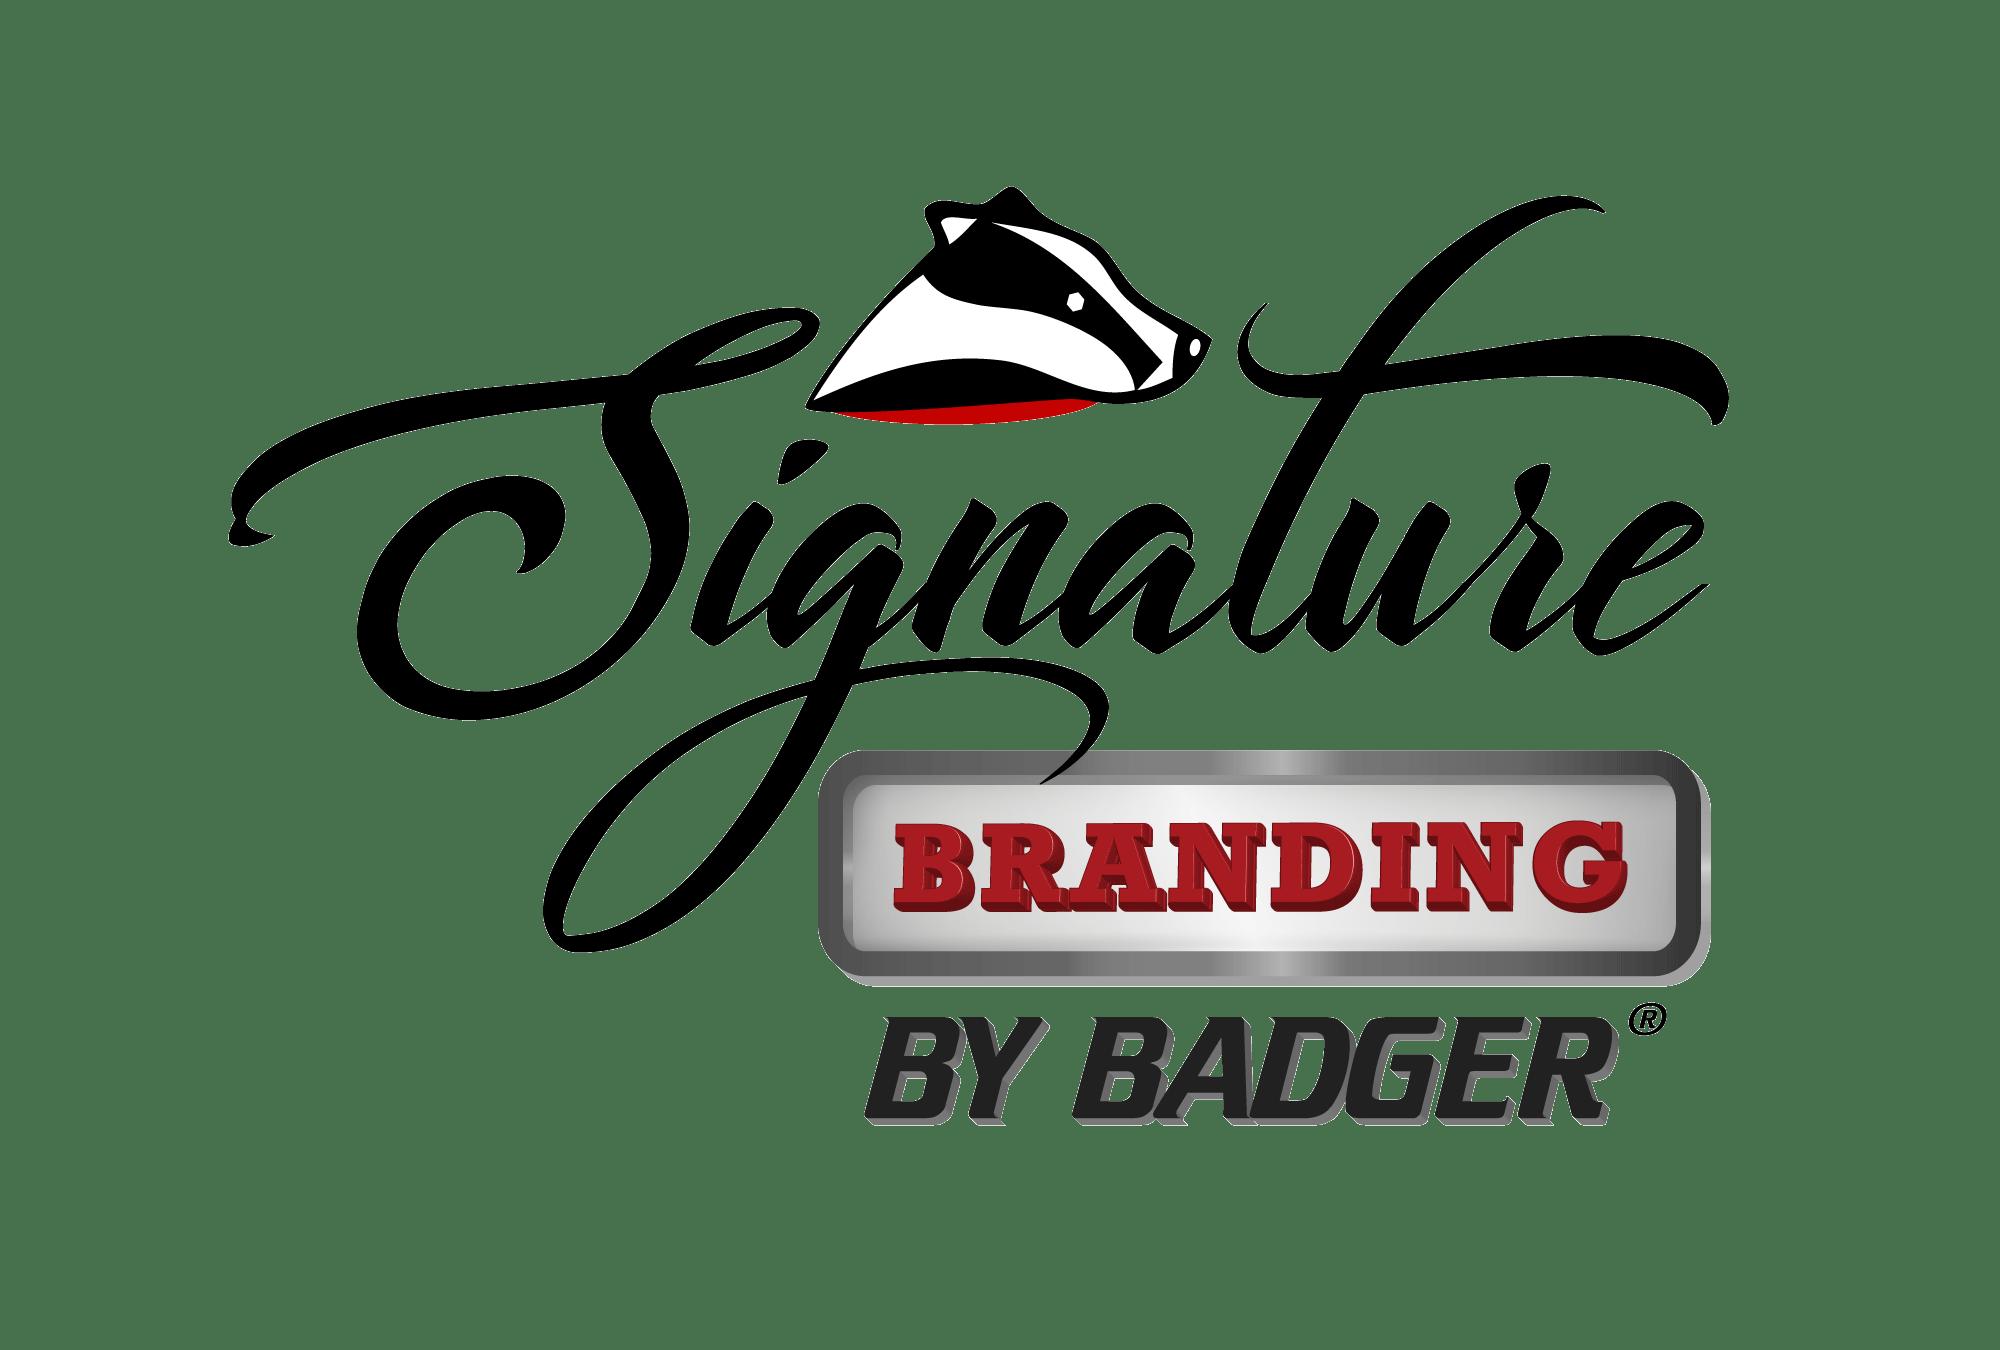 Signature Branding Washing Instructions